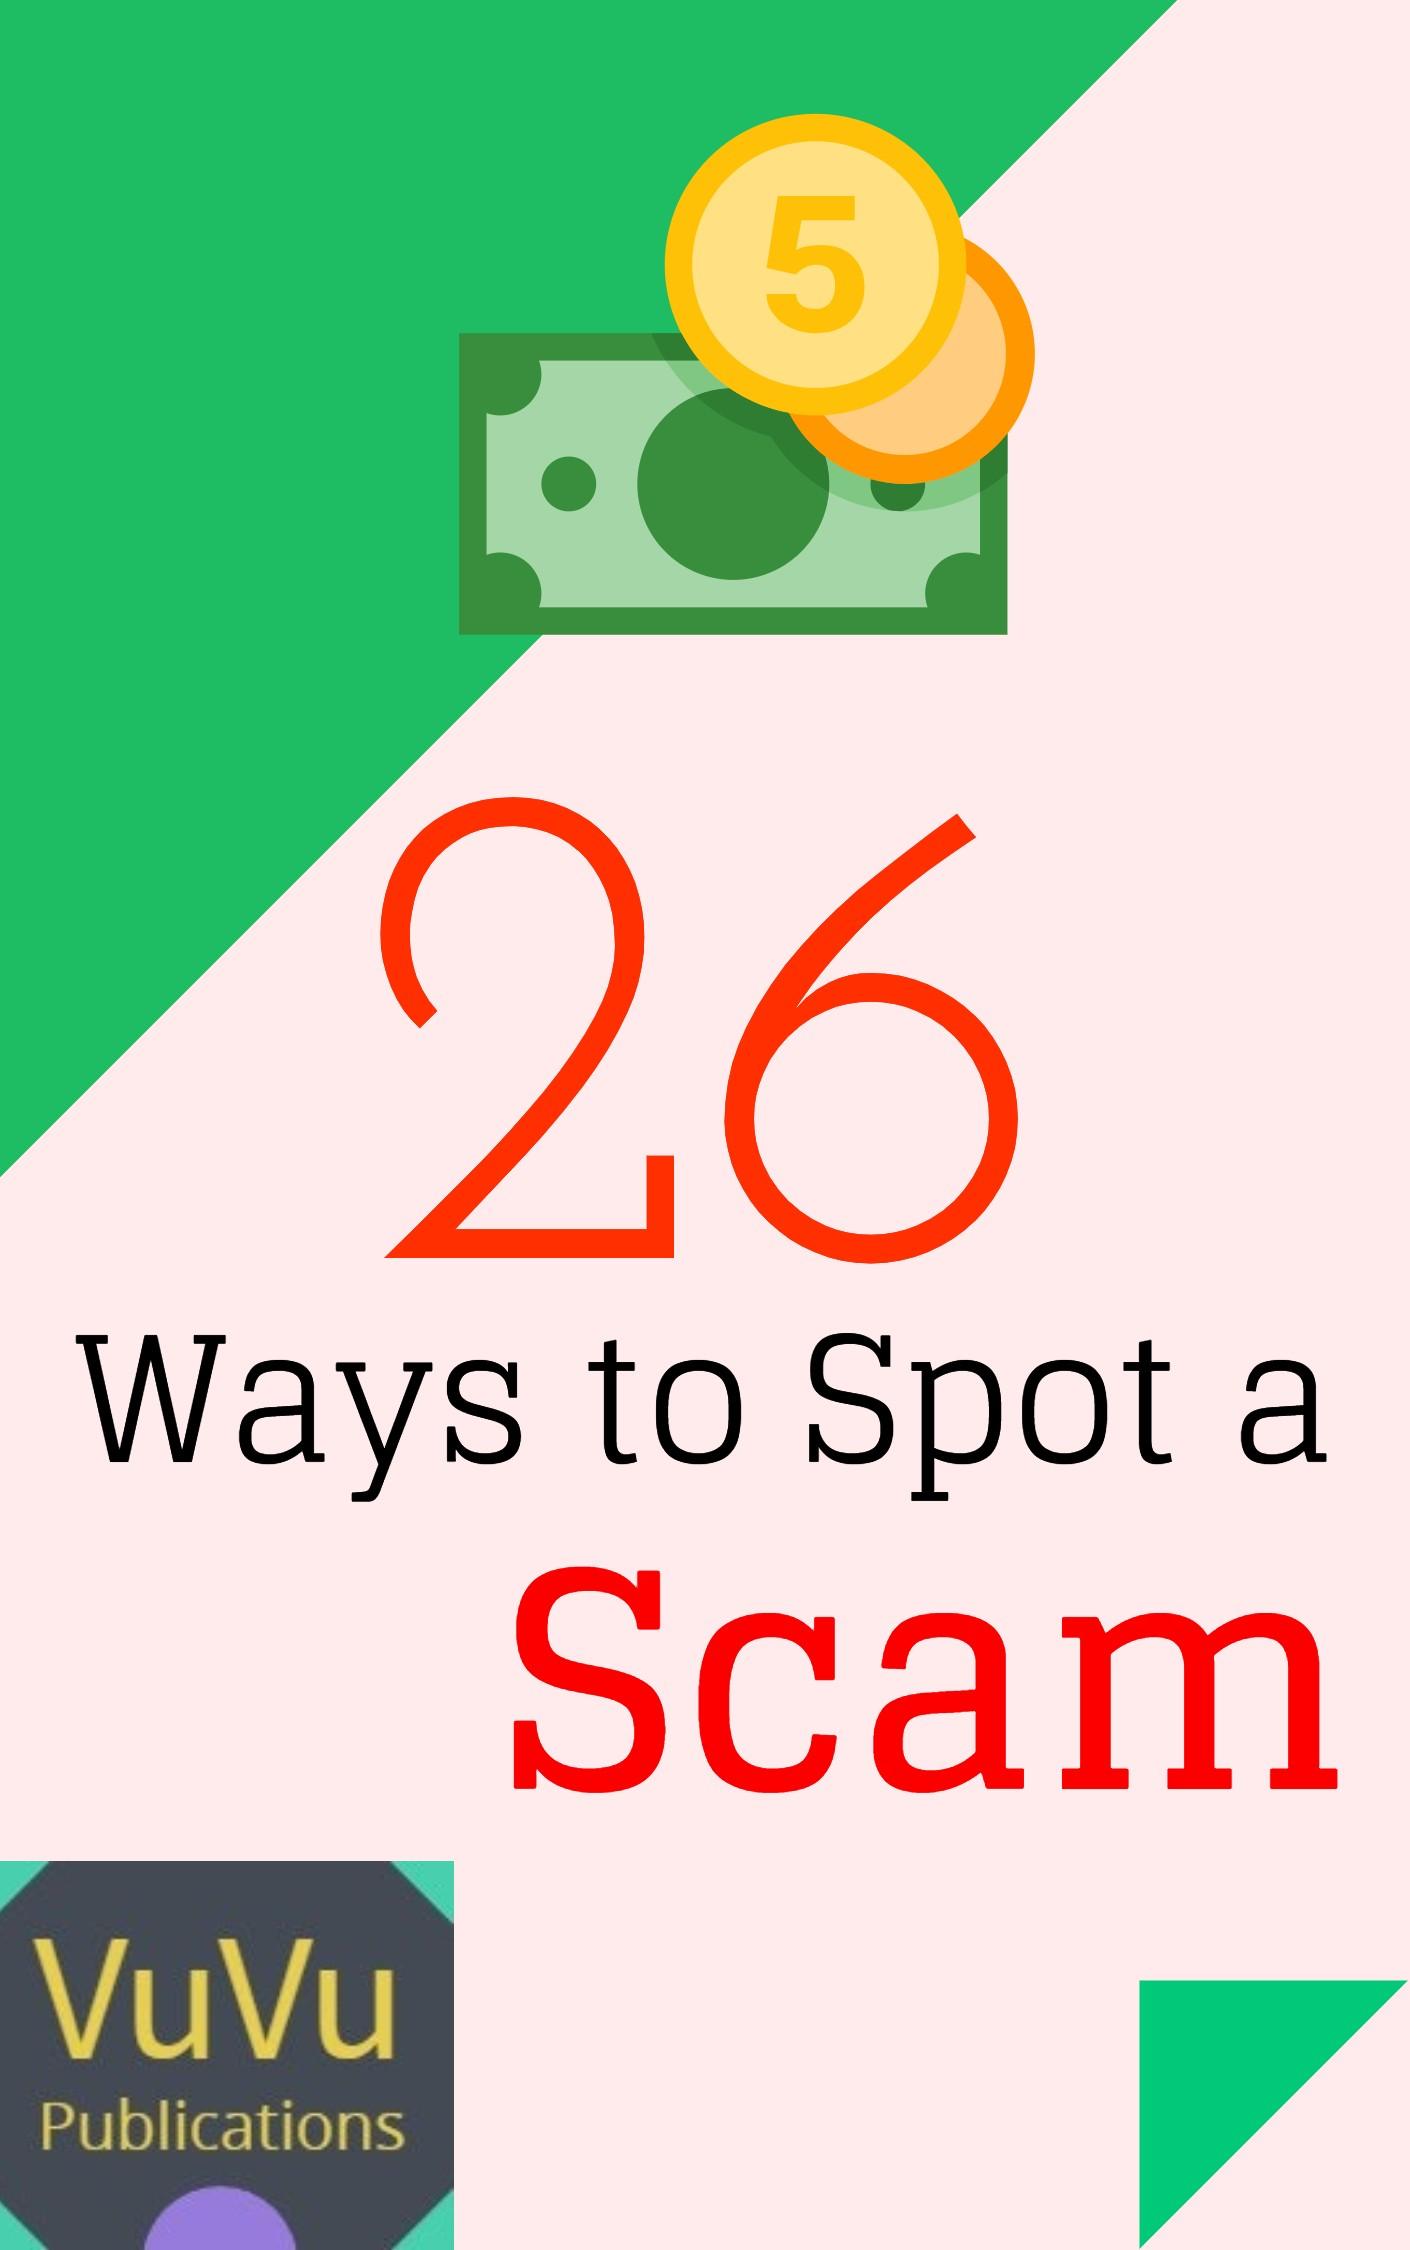 26 Ways to Spot a Scam (1)